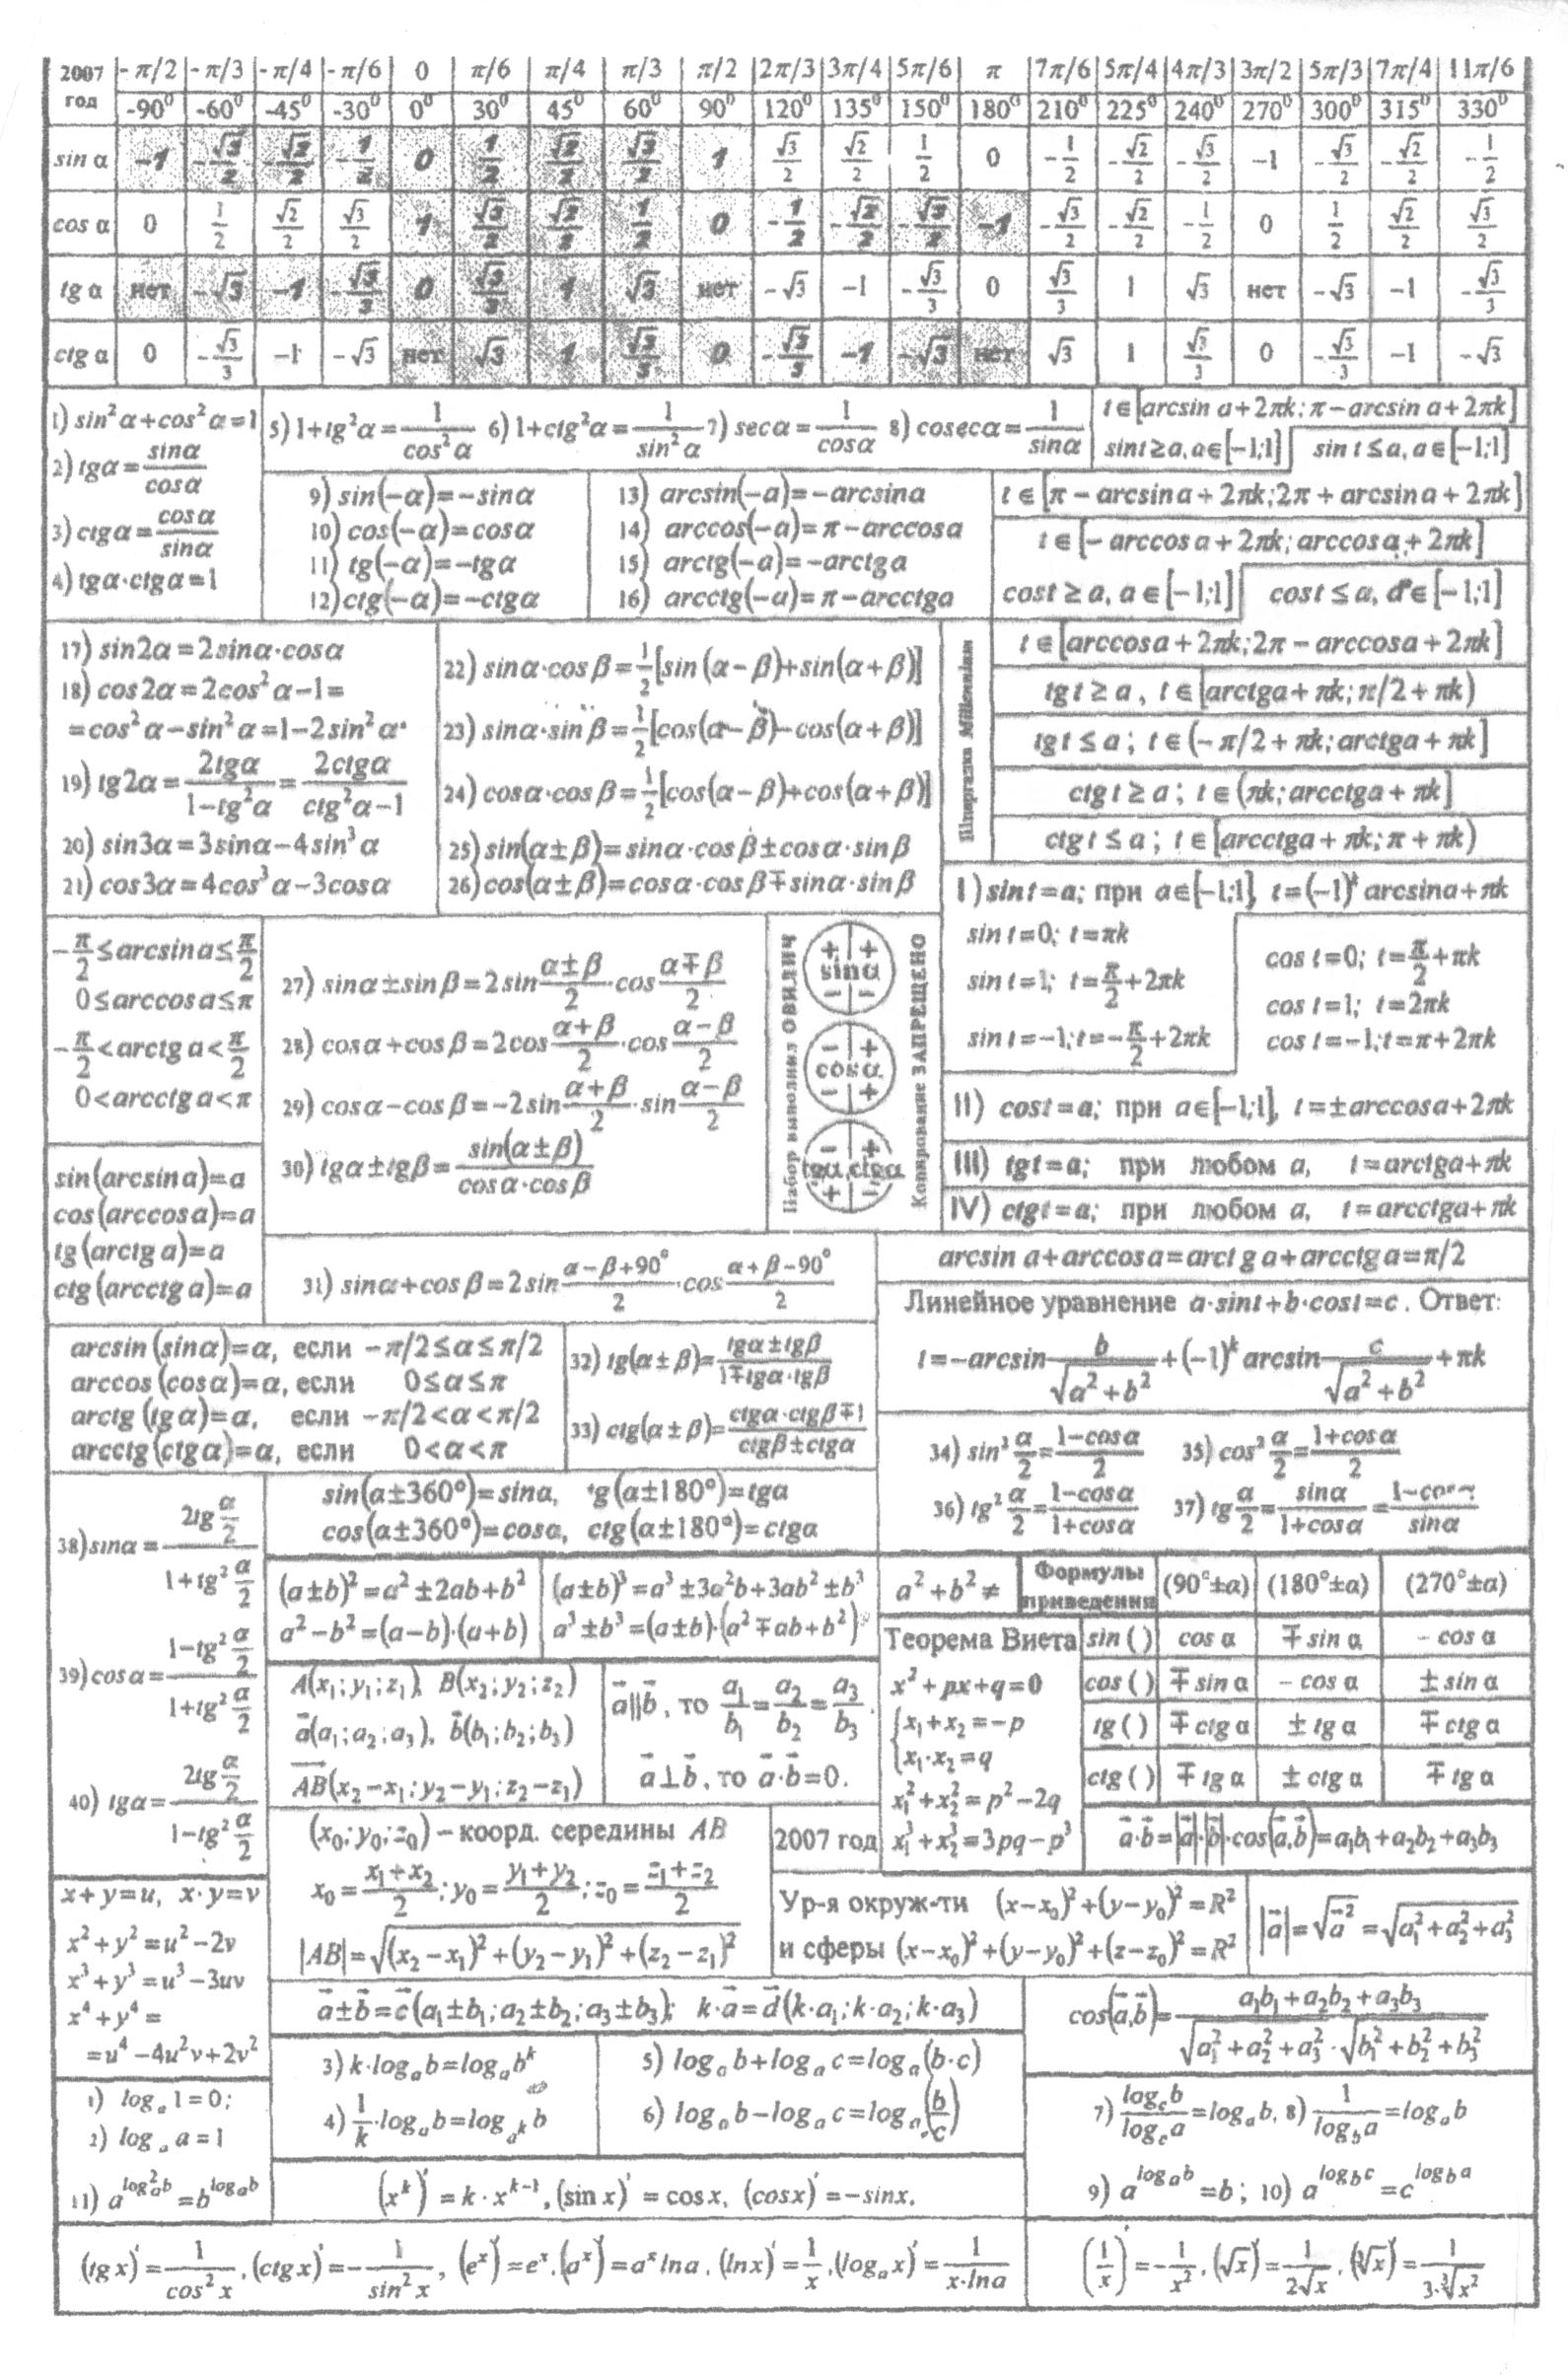 Готовая шпаргалка формул по математике